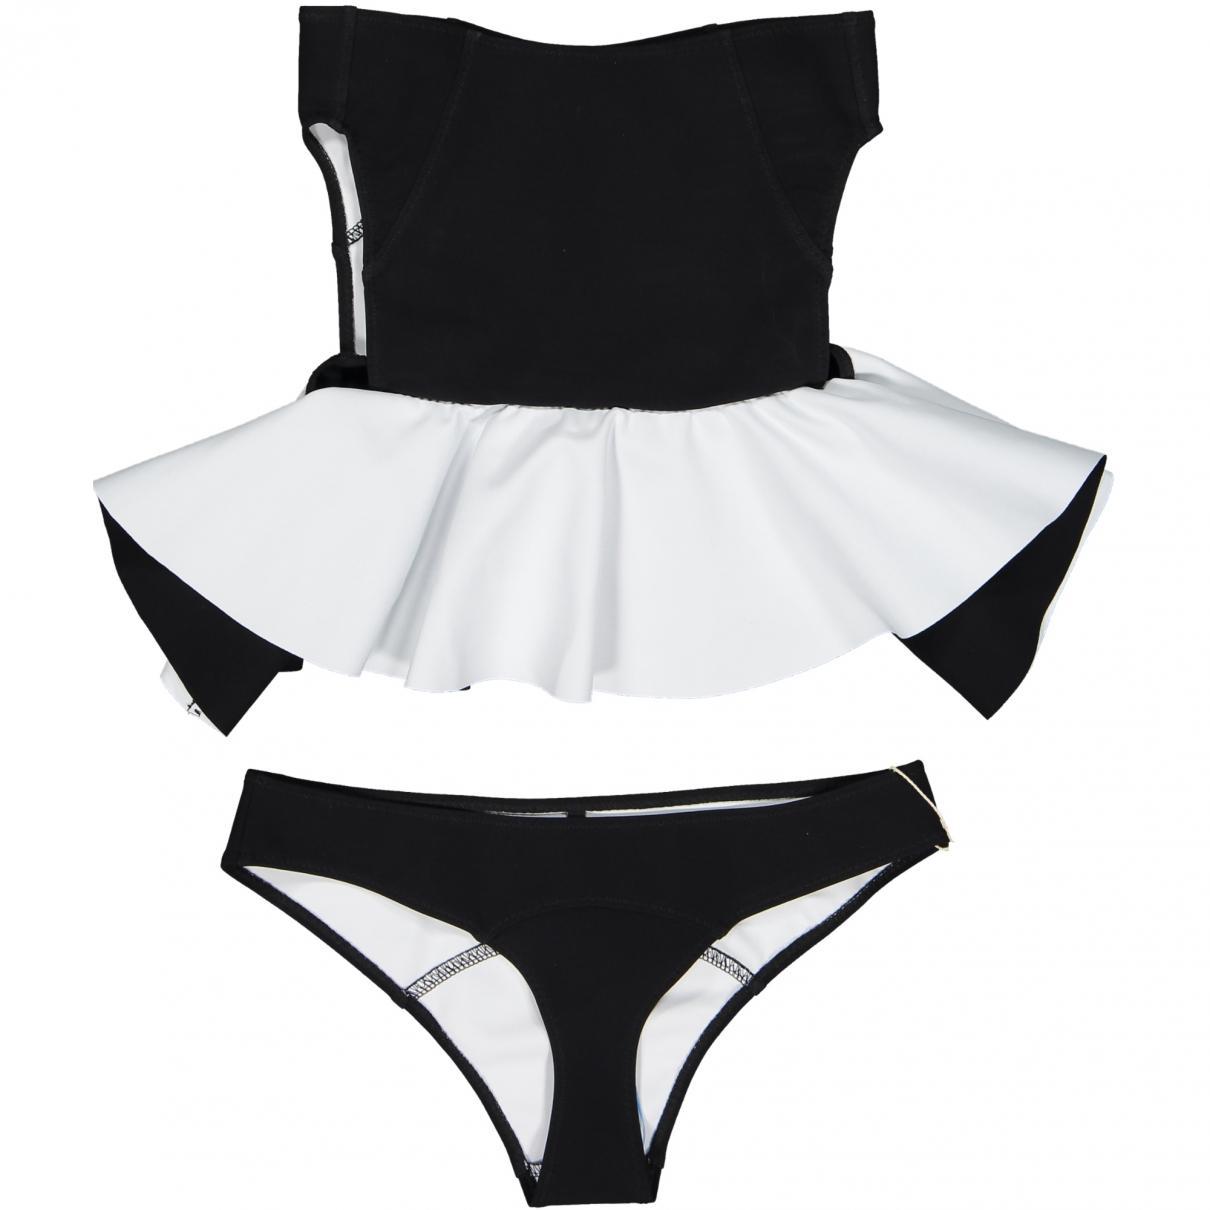 2b58237d51 Lisa Marie Fernandez. Women's Black Synthetic Swimwear. $196 From Vestiaire  Collective